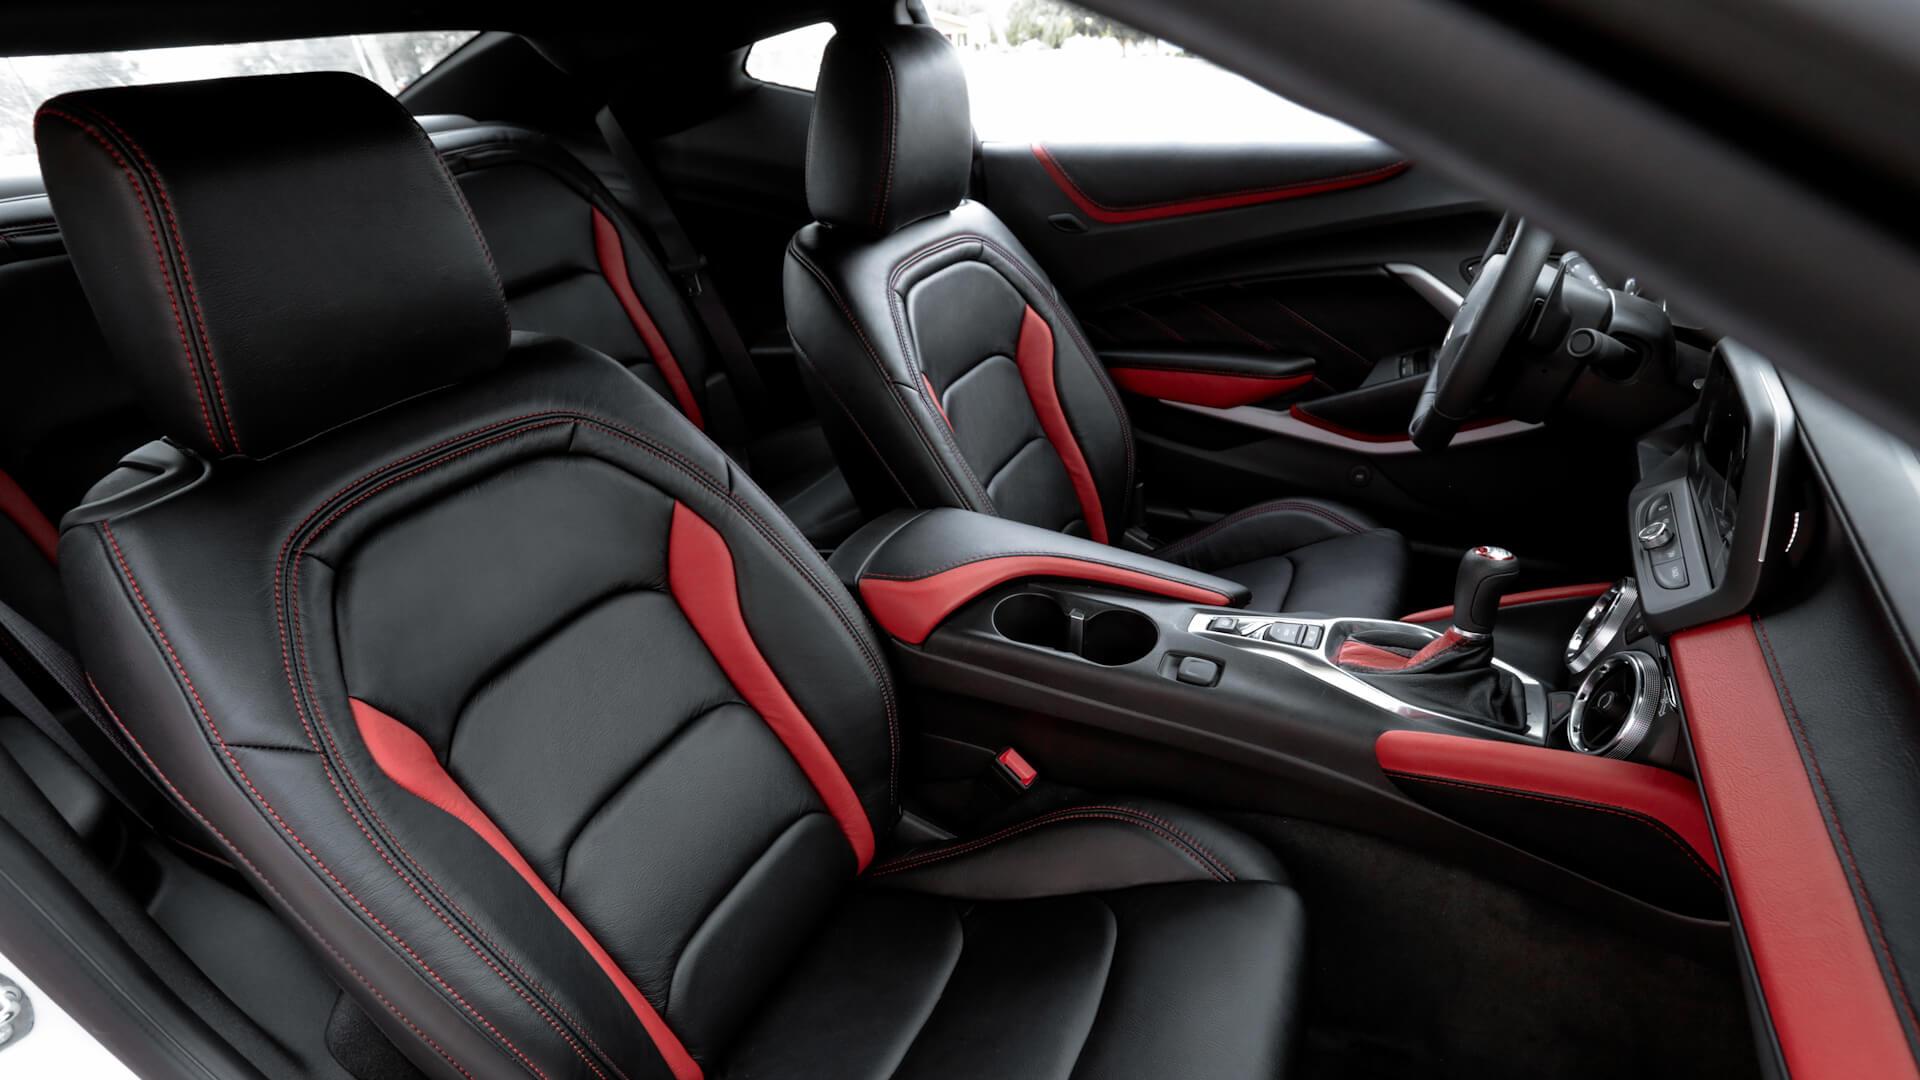 Custom Leather Interior - Leatherseats.com